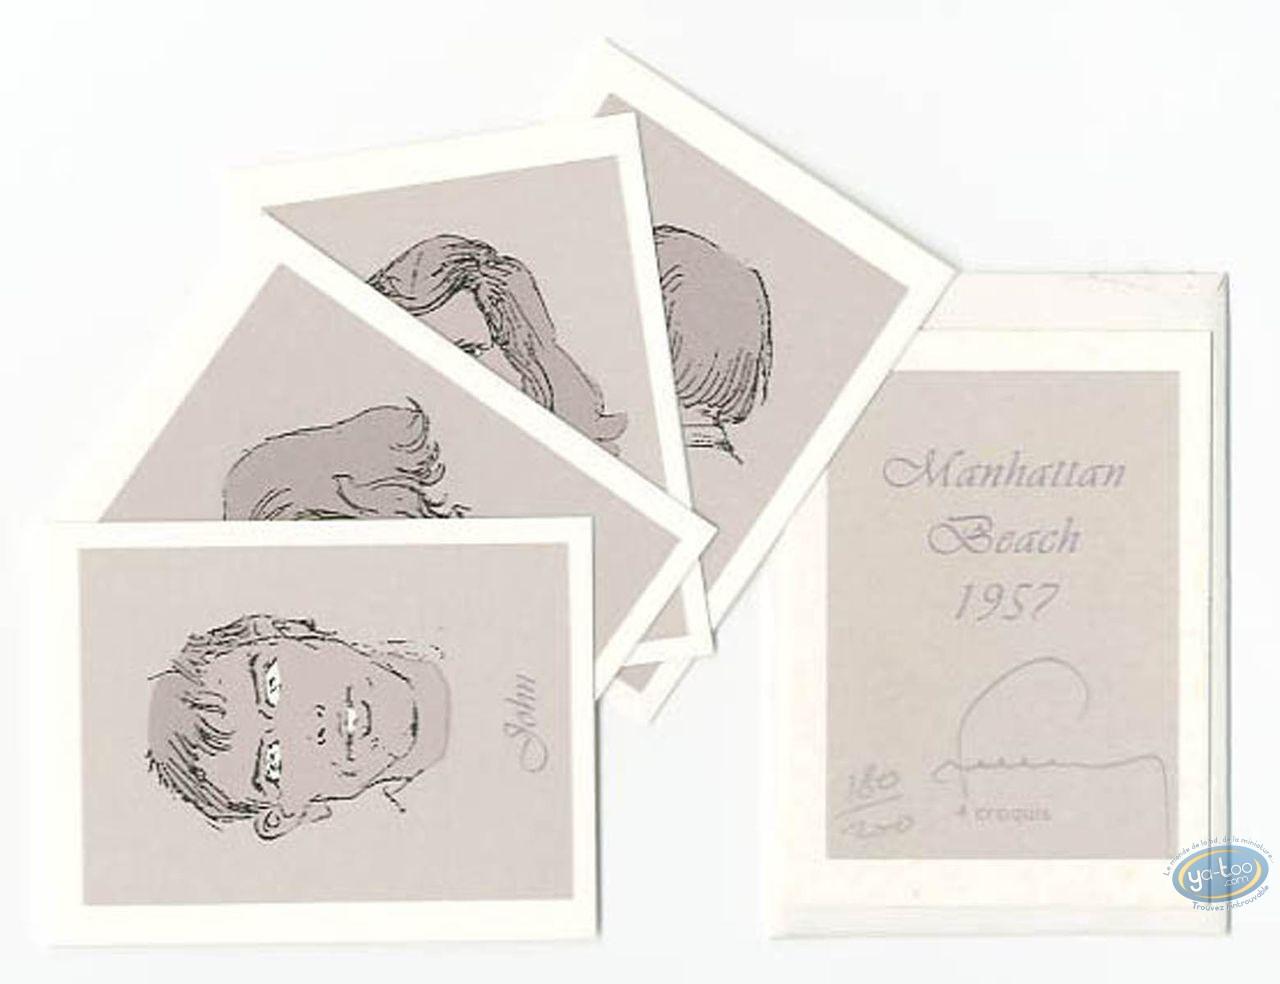 Bookplate Serigraph, Manhattan Beach 1957 : Galery of Porraits